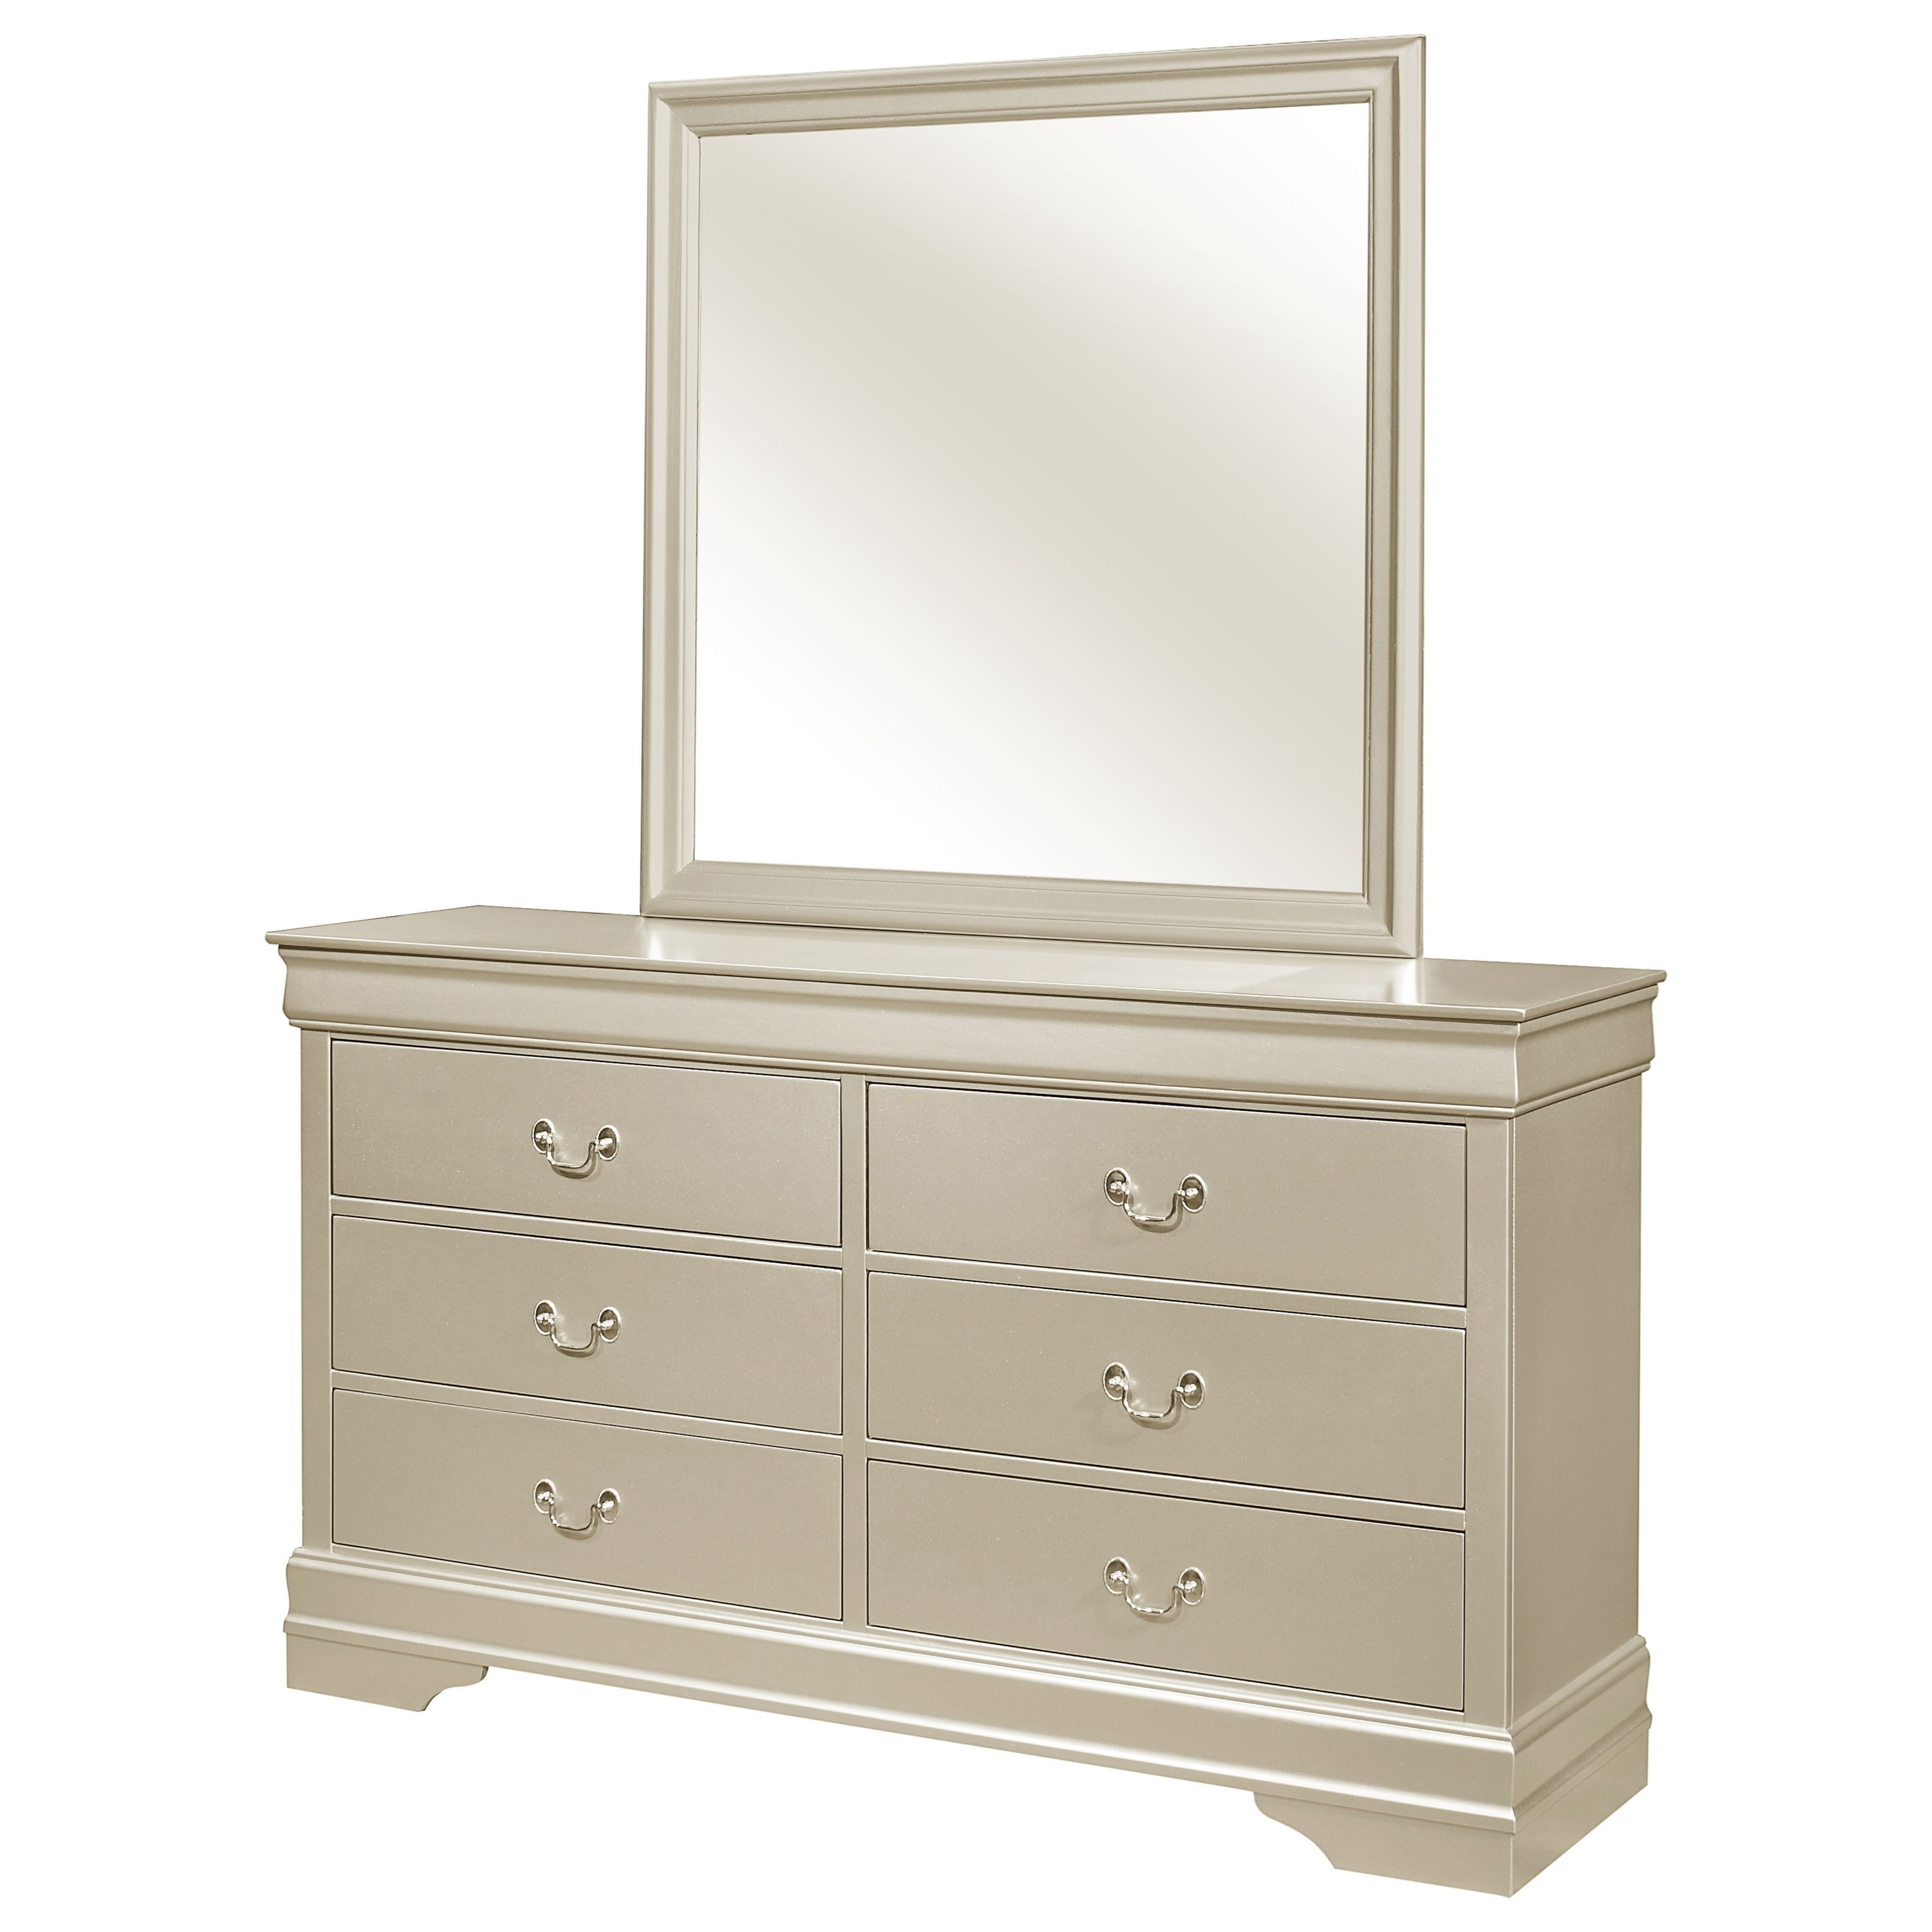 Crown Mark Louis Philip Transitional 6 Drawer Dresser With Mirror